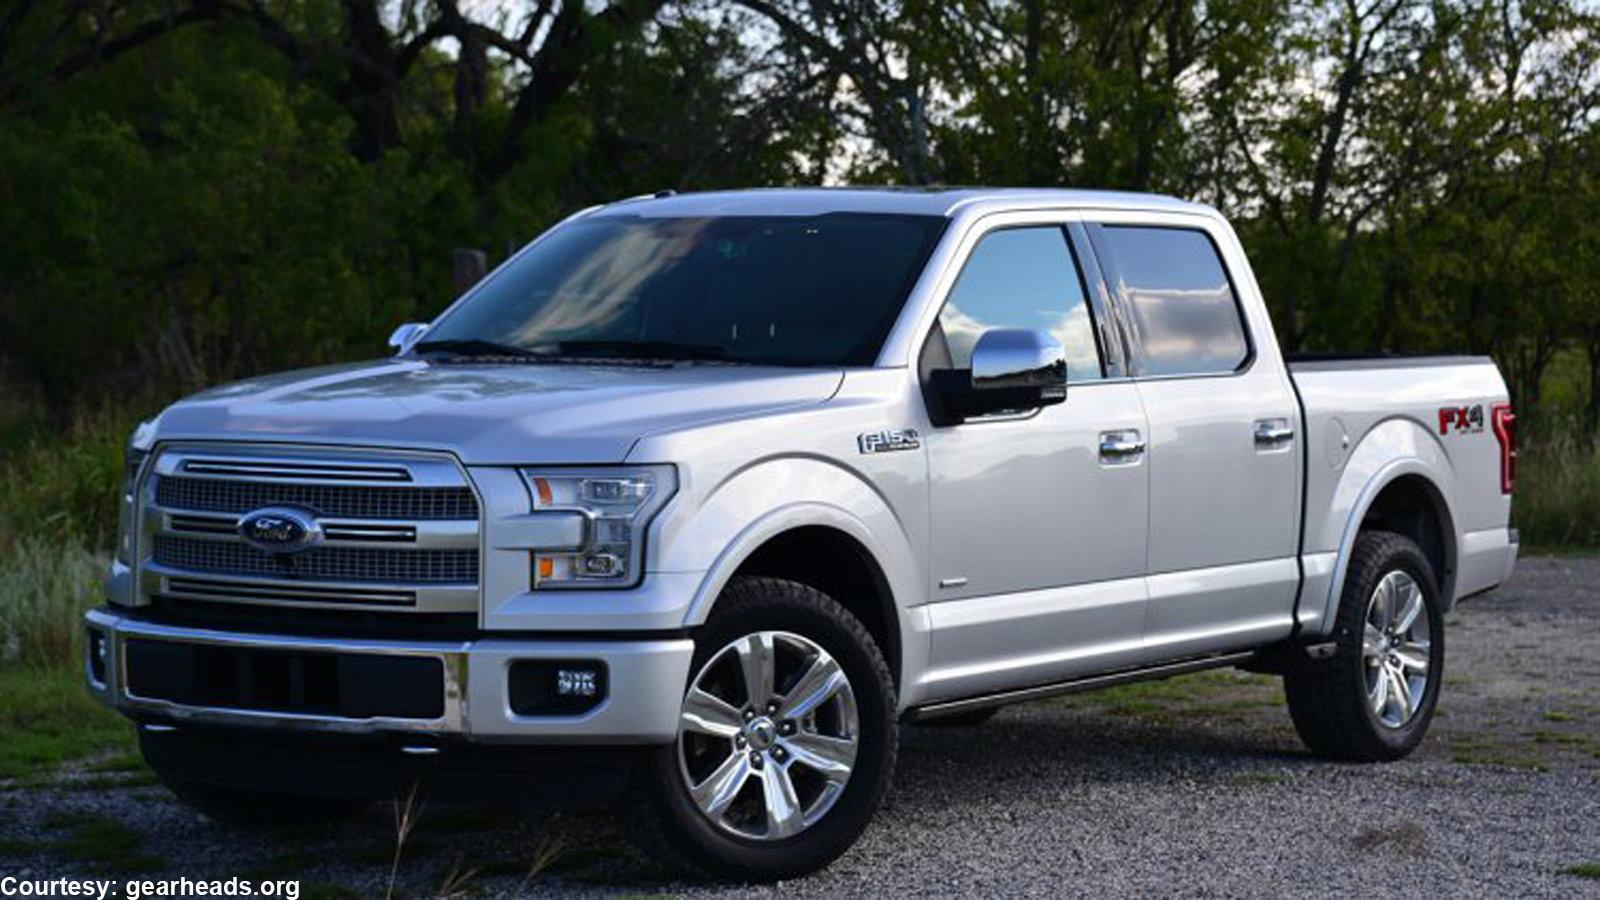 Ford focusing on trucks